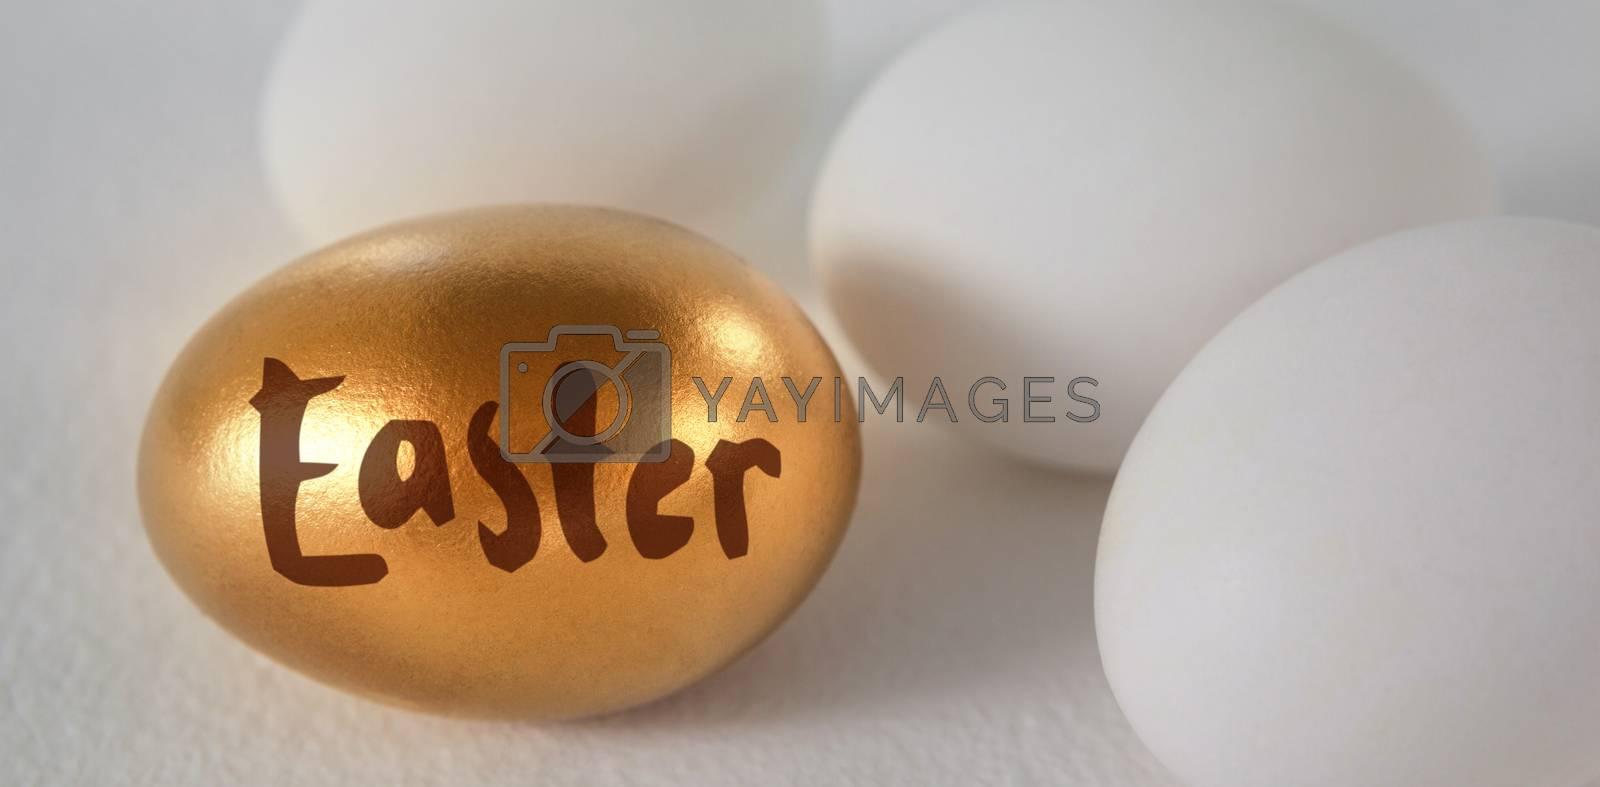 Easter greeting against white and golden easter eggs